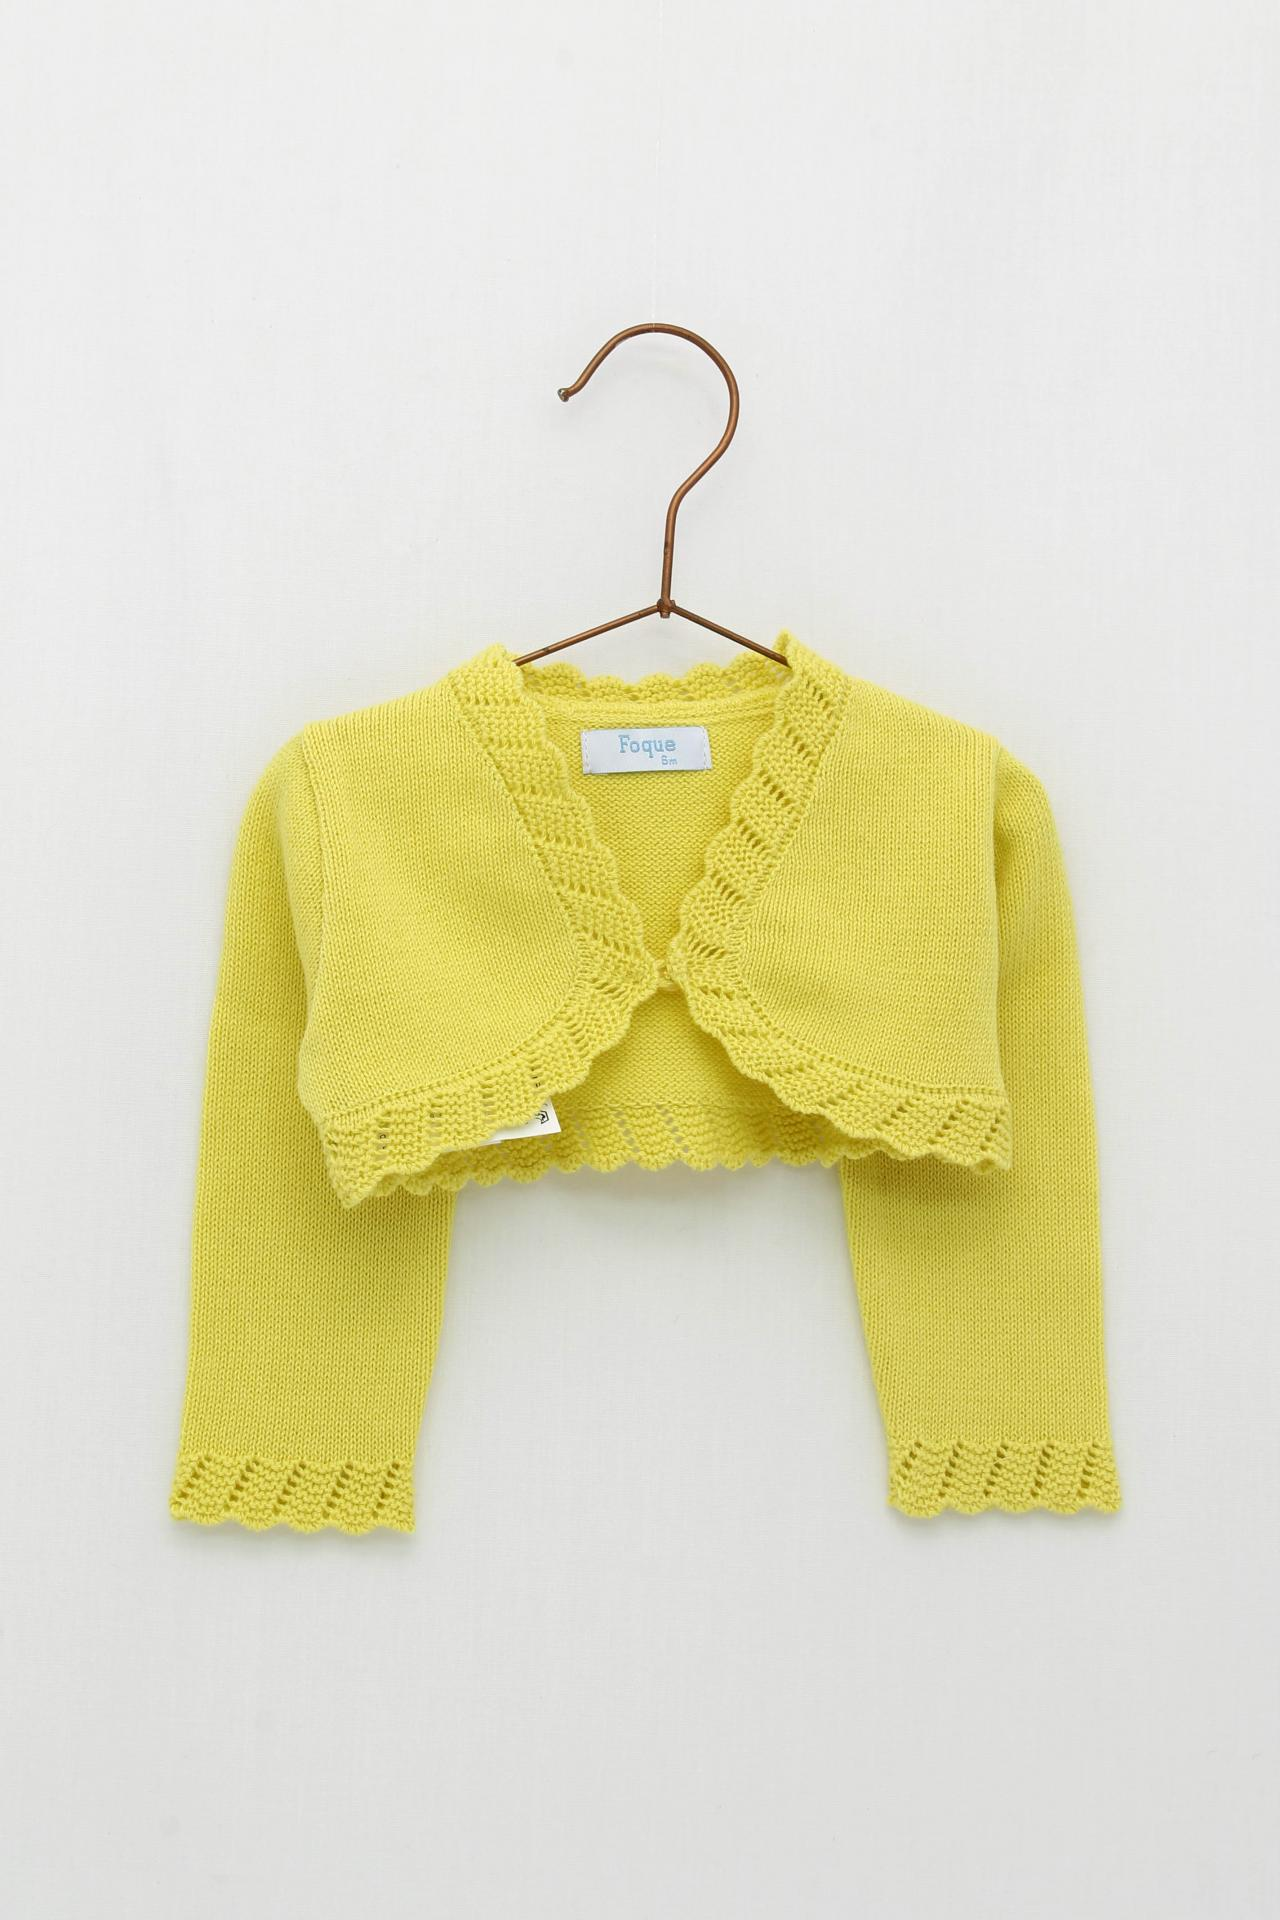 Chaqueta Foque puntas color amarillo colección sun flower.